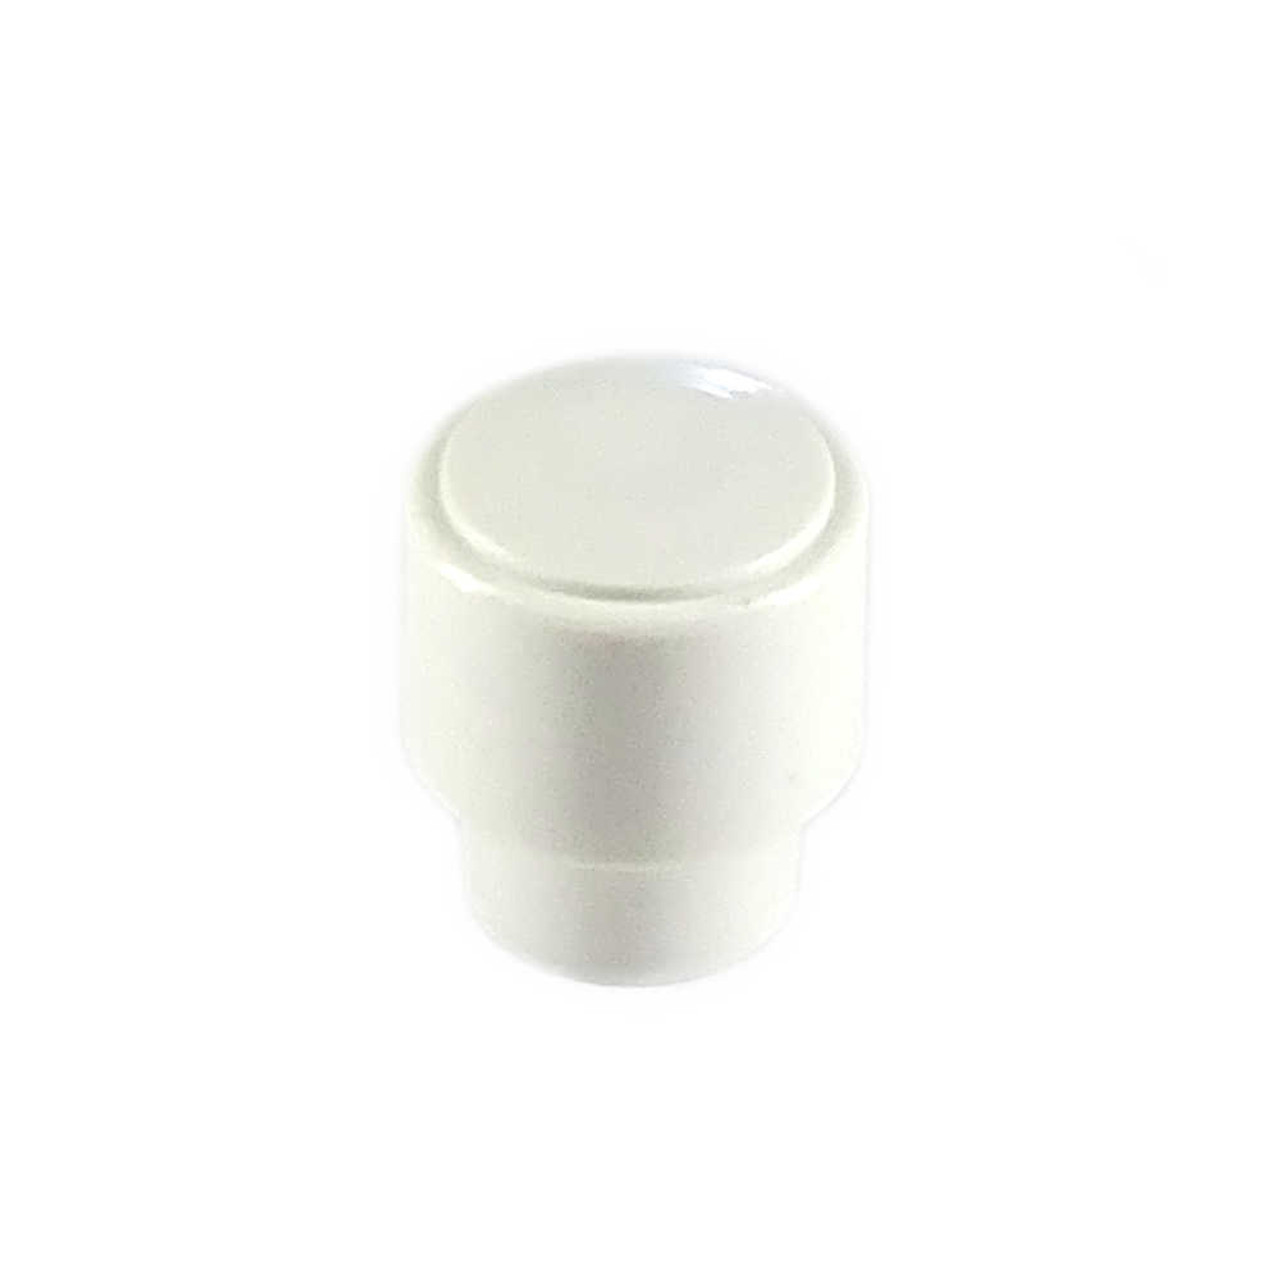 Barrel Switch Tip - White